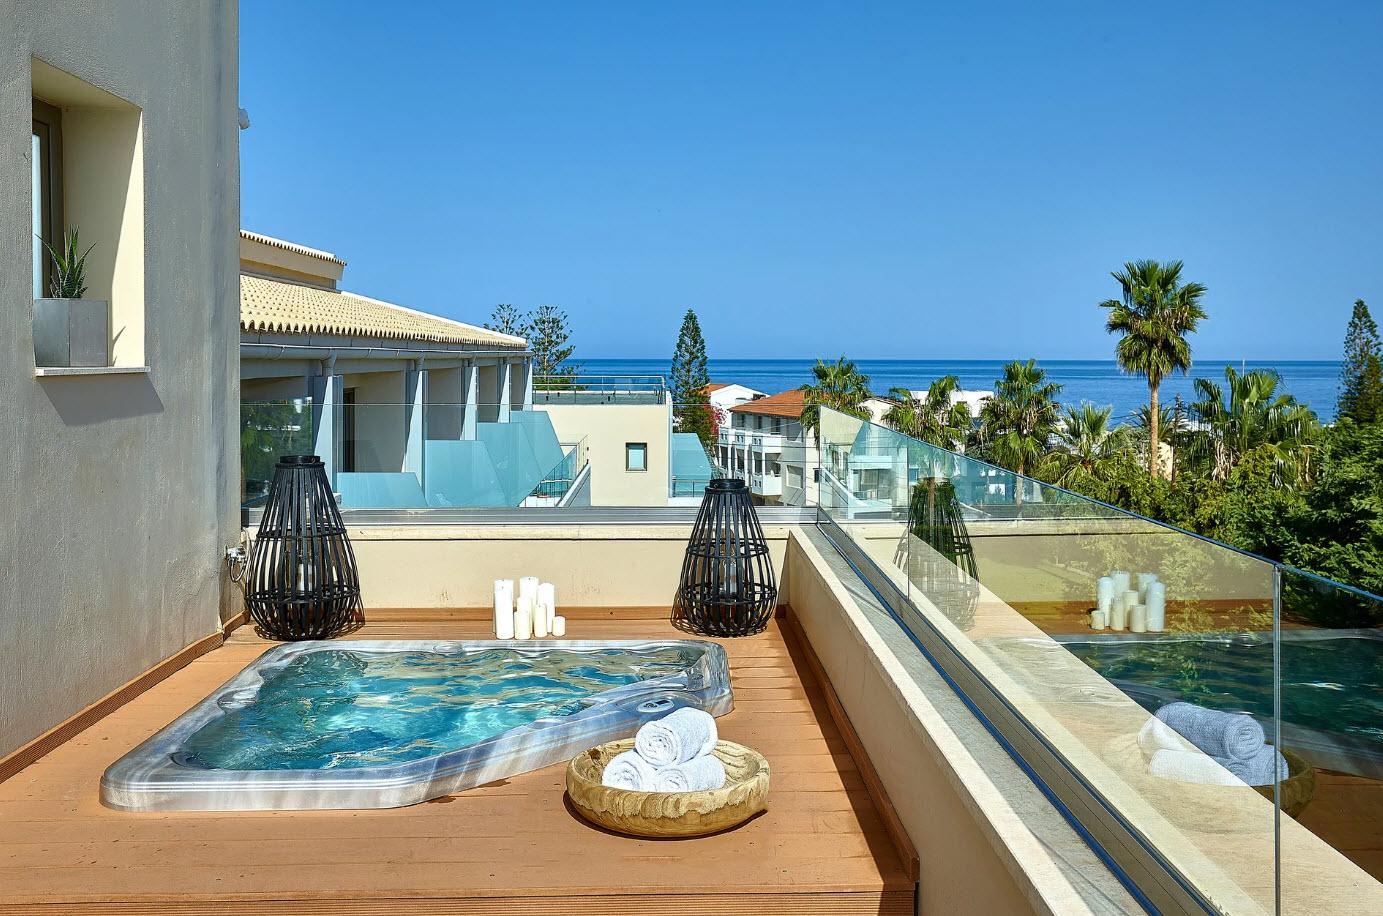 5* Castello Boutique Resort & Spa - Άγιος Νικόλαος, Κρήτη ✦ 2 Ημέρες (1 Διανυκτέρευση) ✦ 2 άτομα ✦ ✦ 01/09/2021 έως 30/09/2021 ✦ Κοντά σε παραλία!